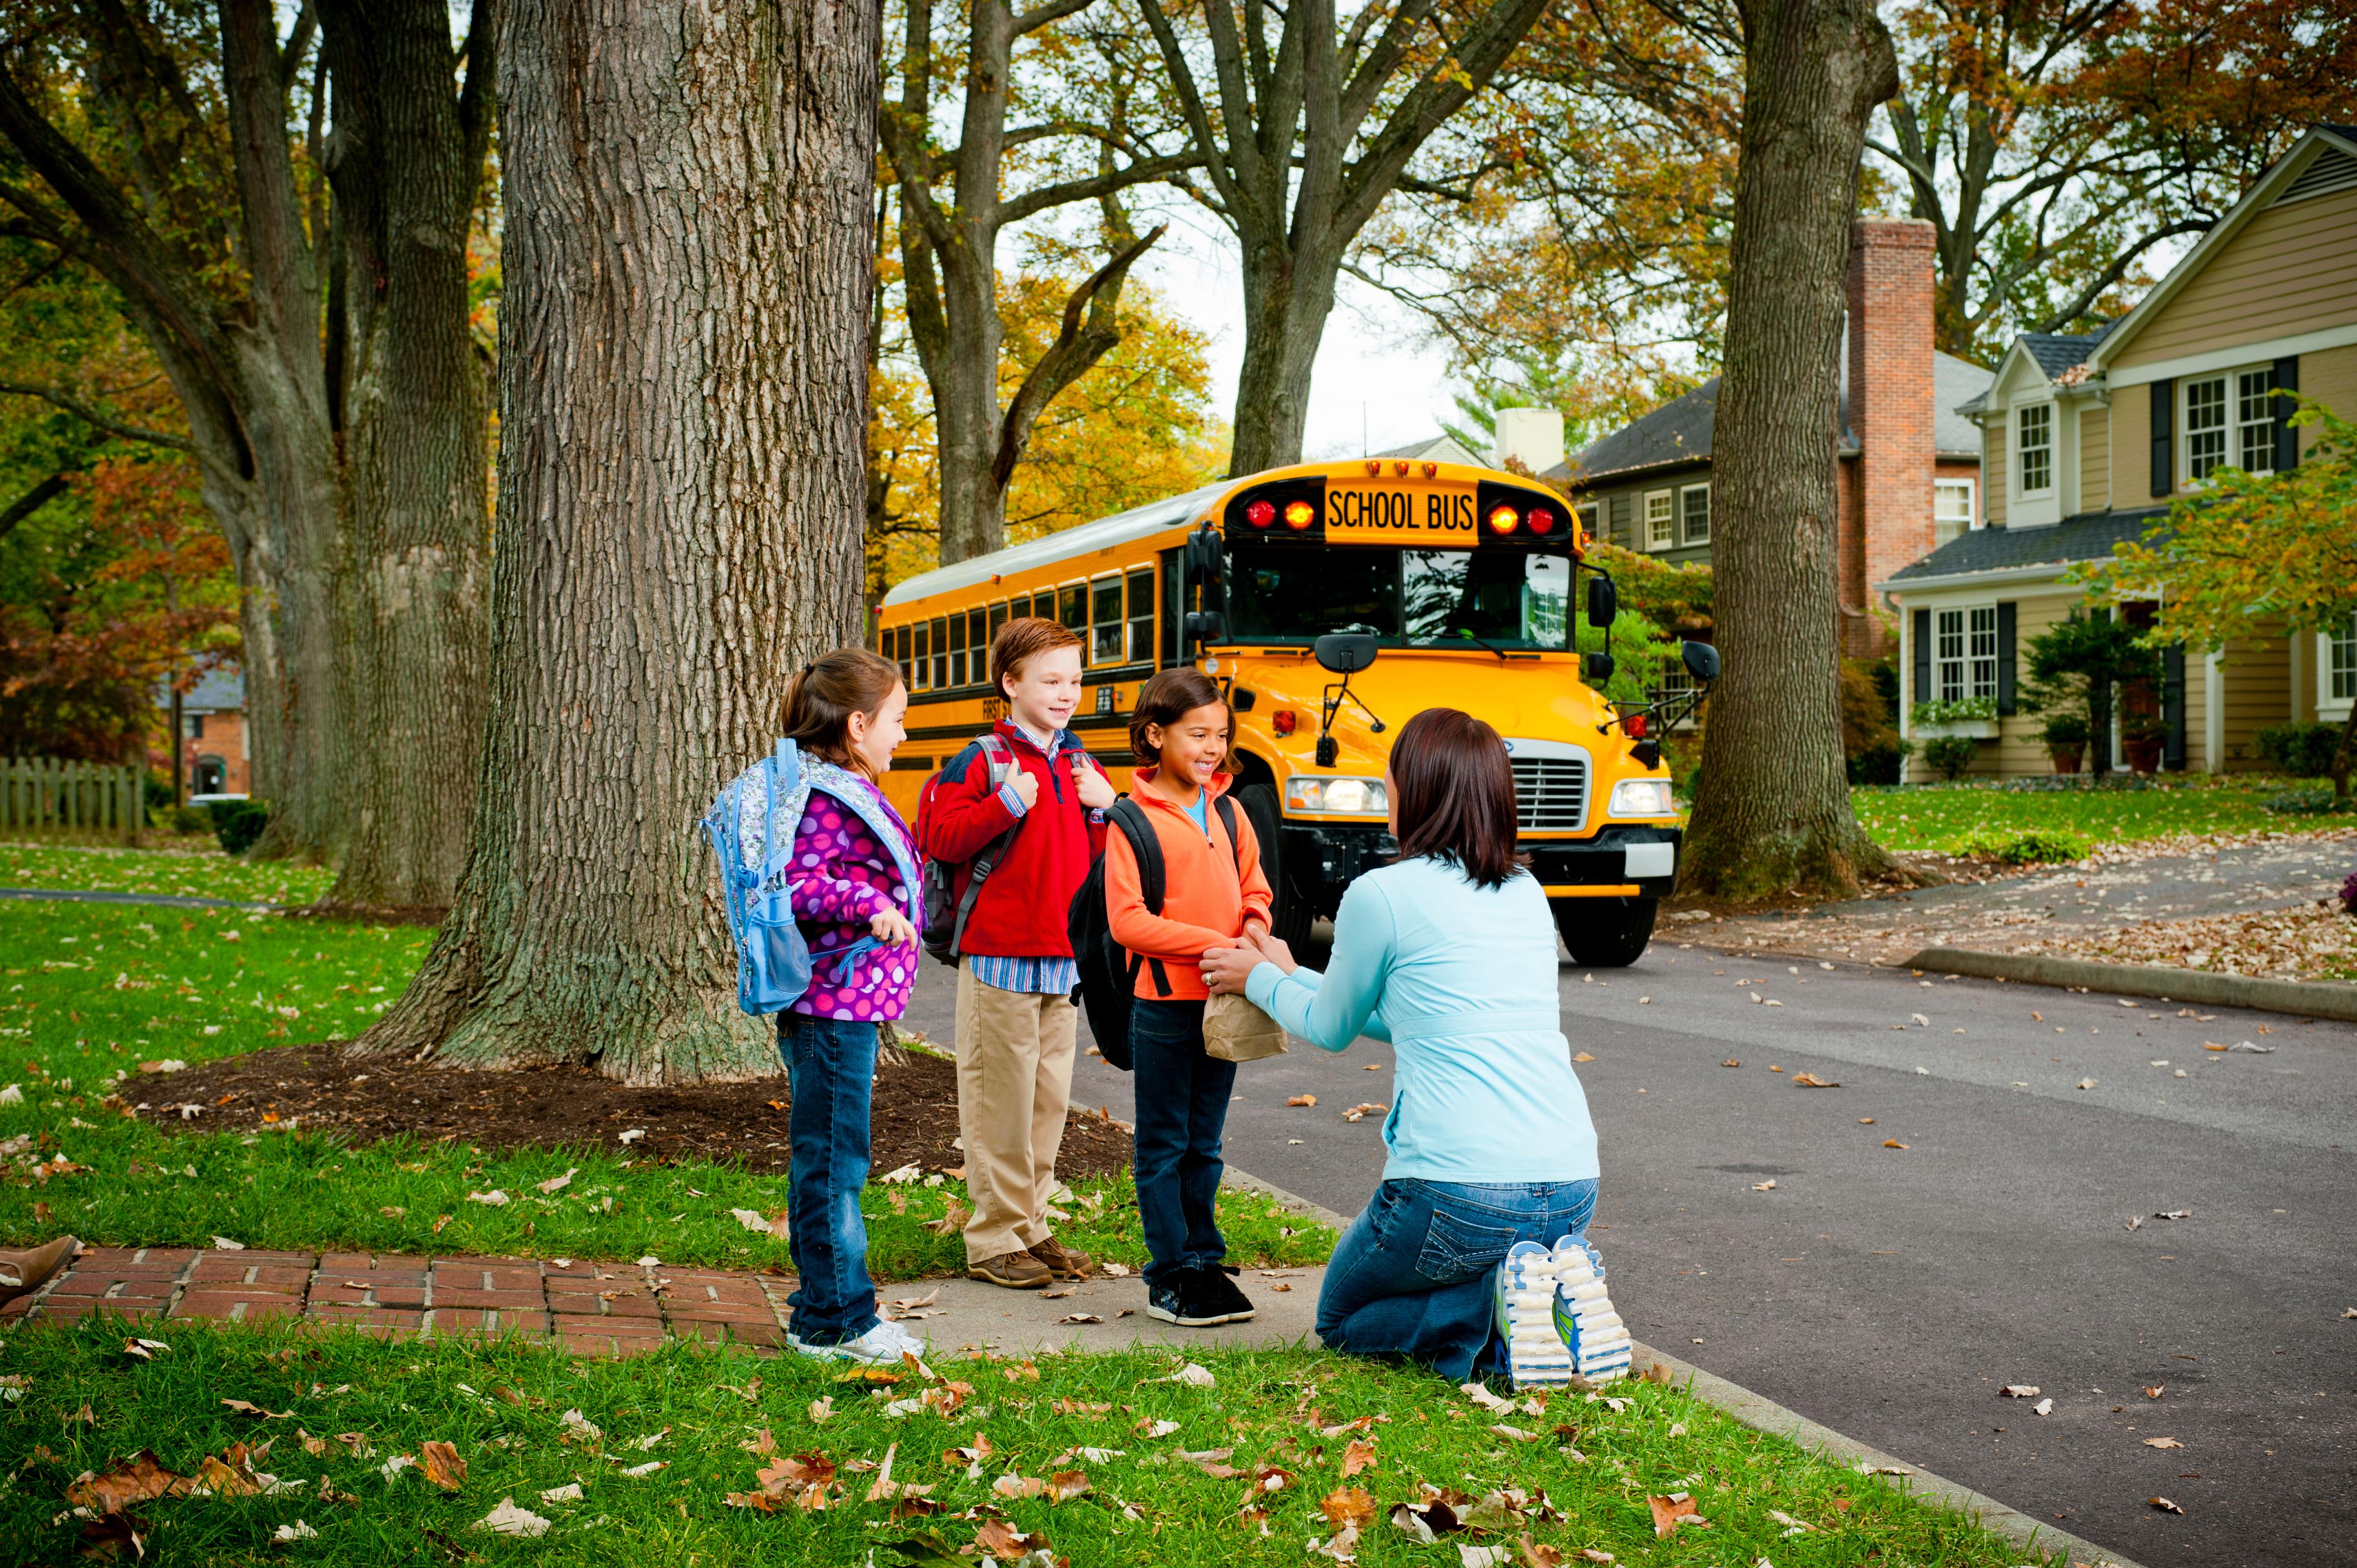 Helping Kindergartners love riding the bus